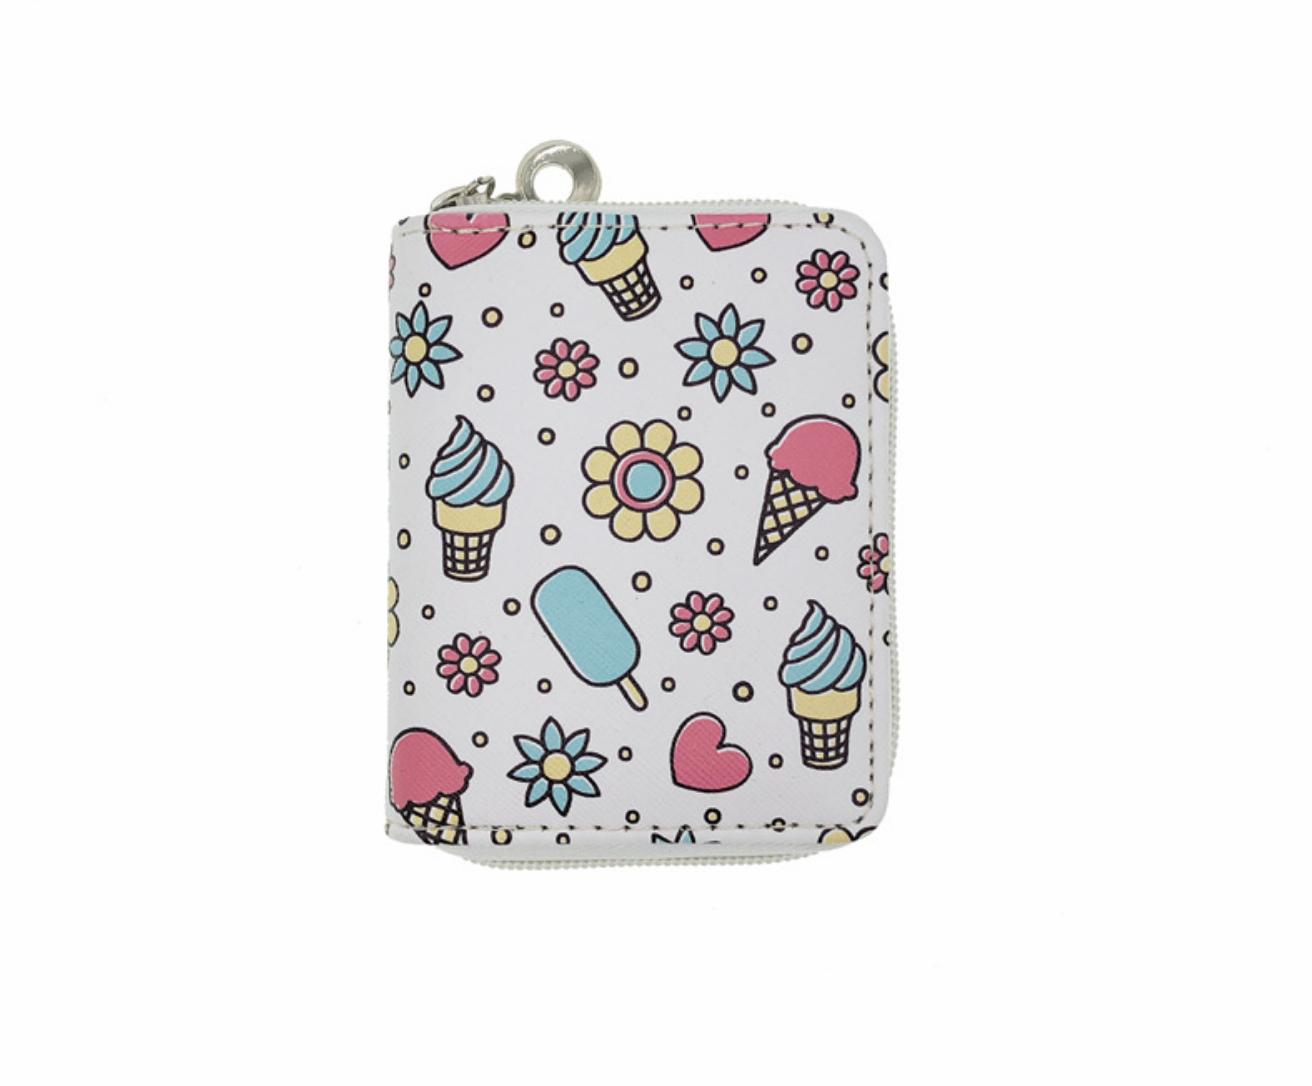 JR-730 Ice Cream Wallet